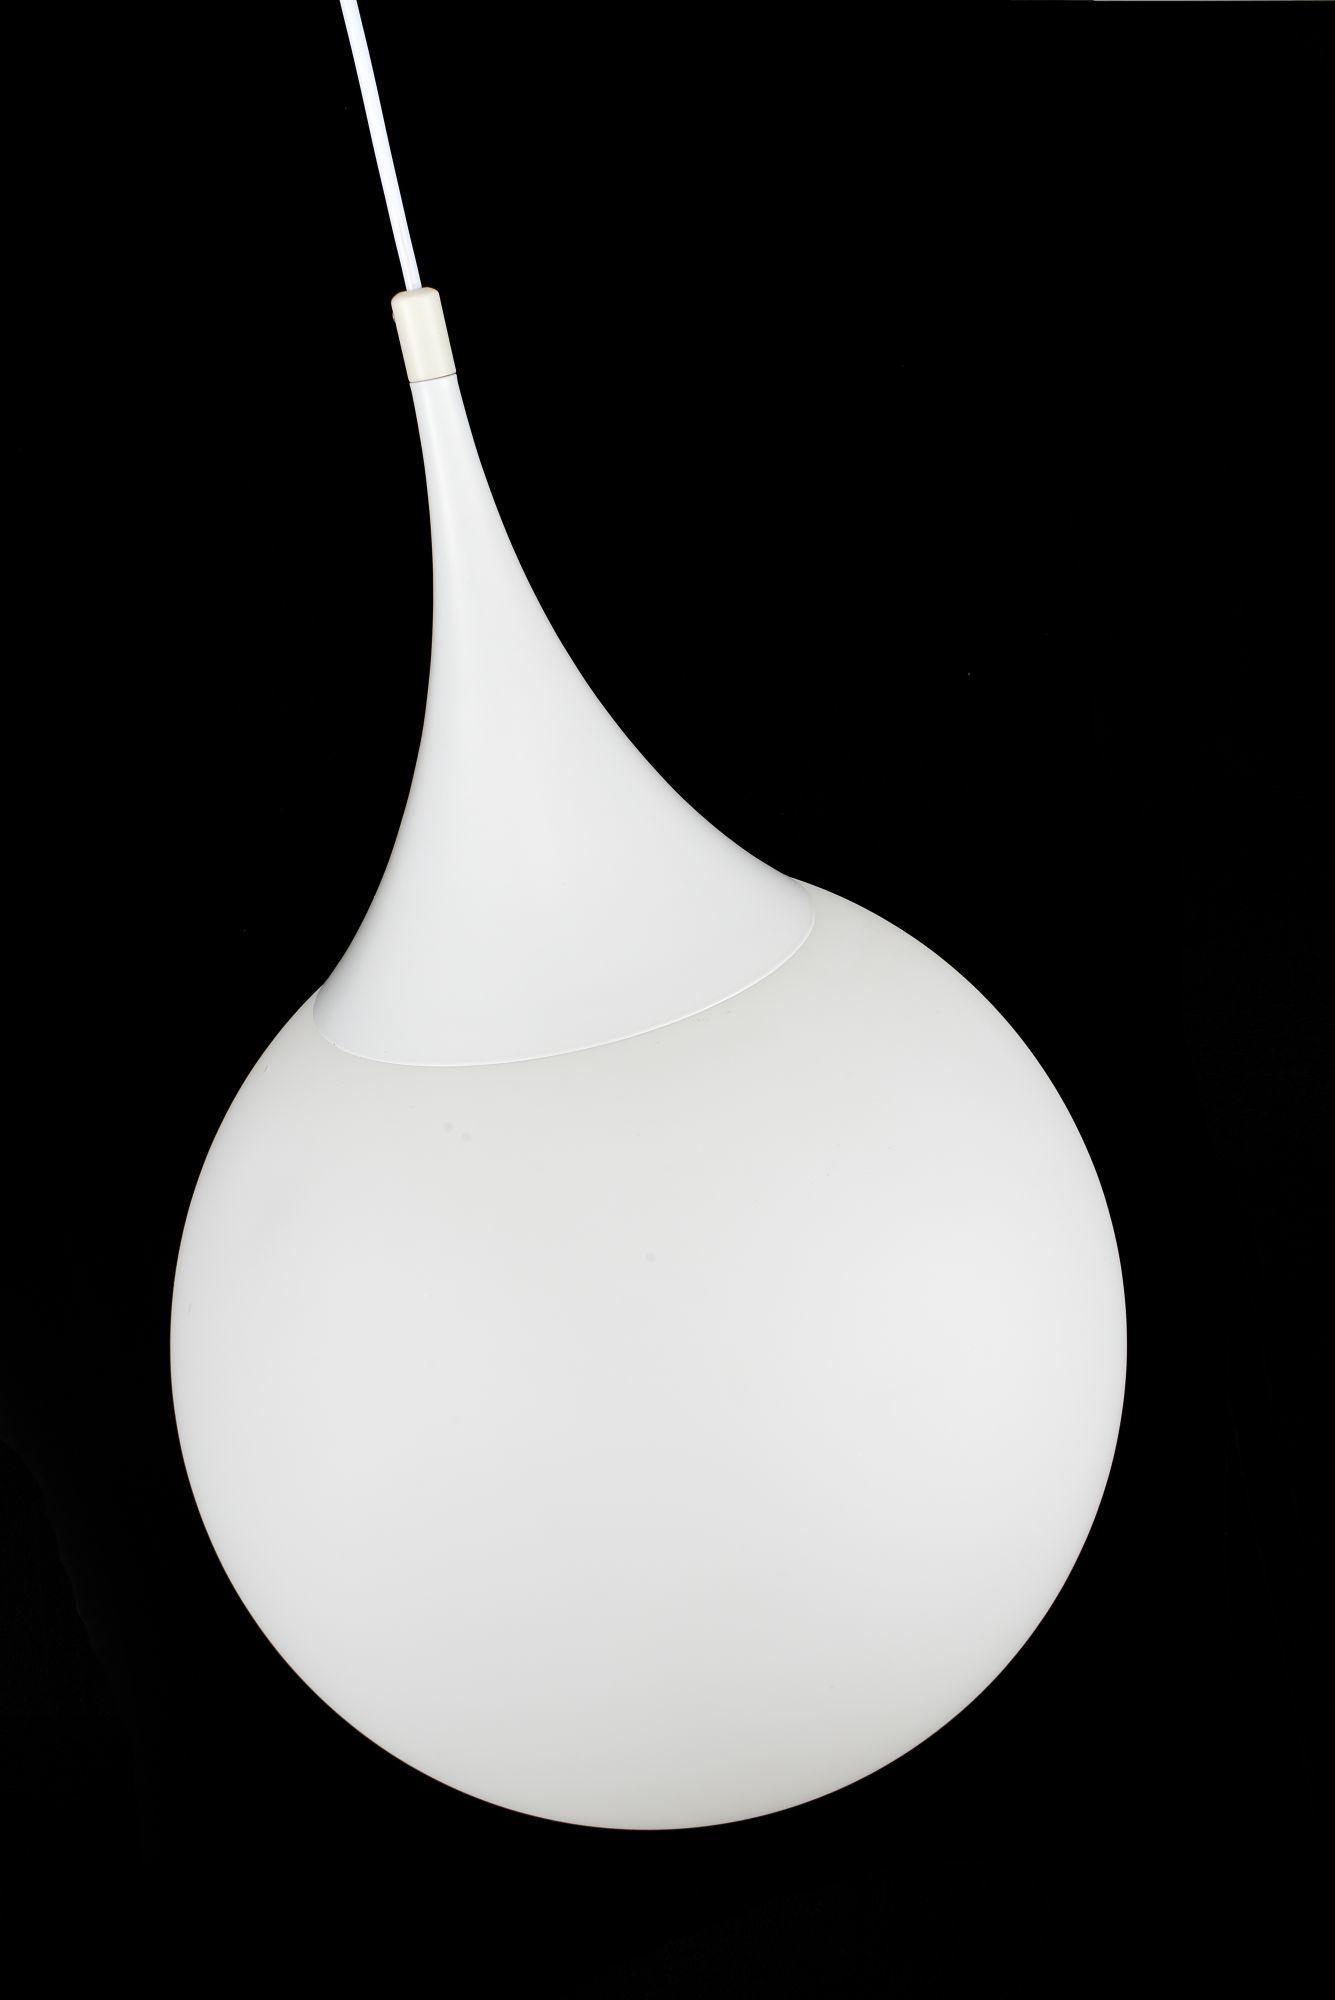 Подвесной светильник Maytoni Dewdrop P225-PL-400-N (MOD225-40-N), 1xE27x8W, белый, металл, стекло - фото 7